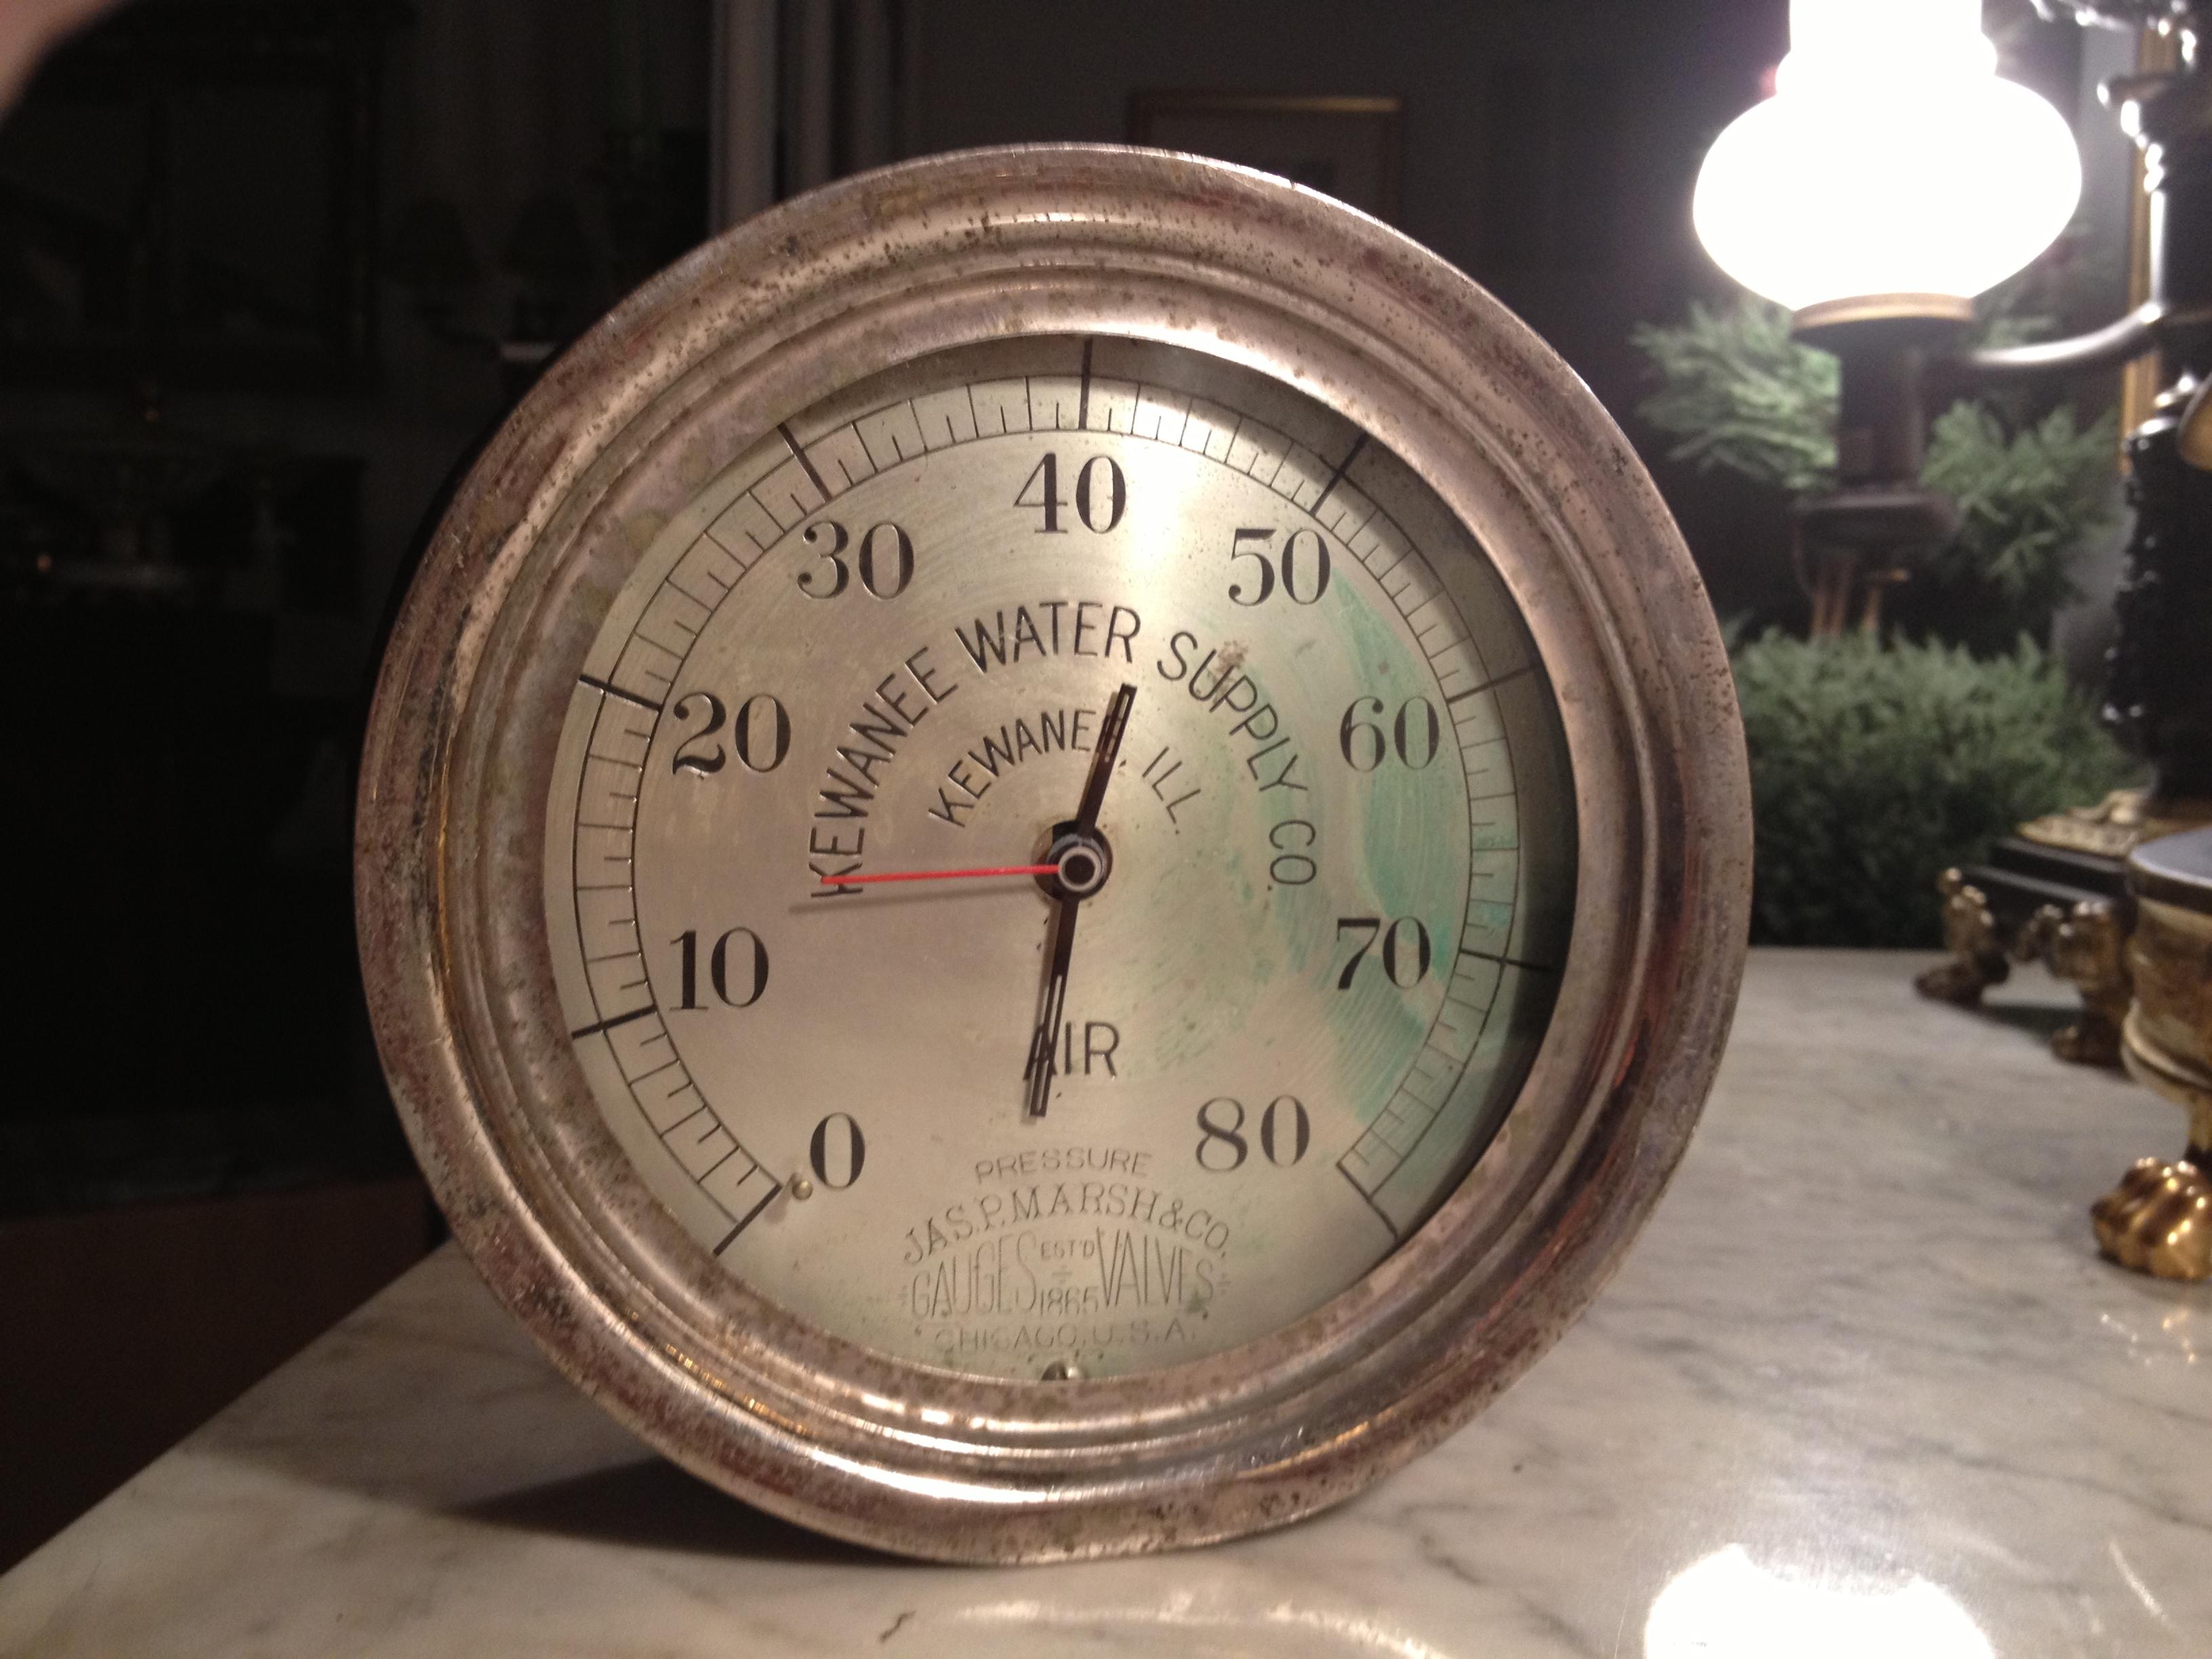 i_gearz_steampunk_hand_made_steam_pressure_gauge_clock_6_battery_op_antique_vintage_clocks_10.JPG